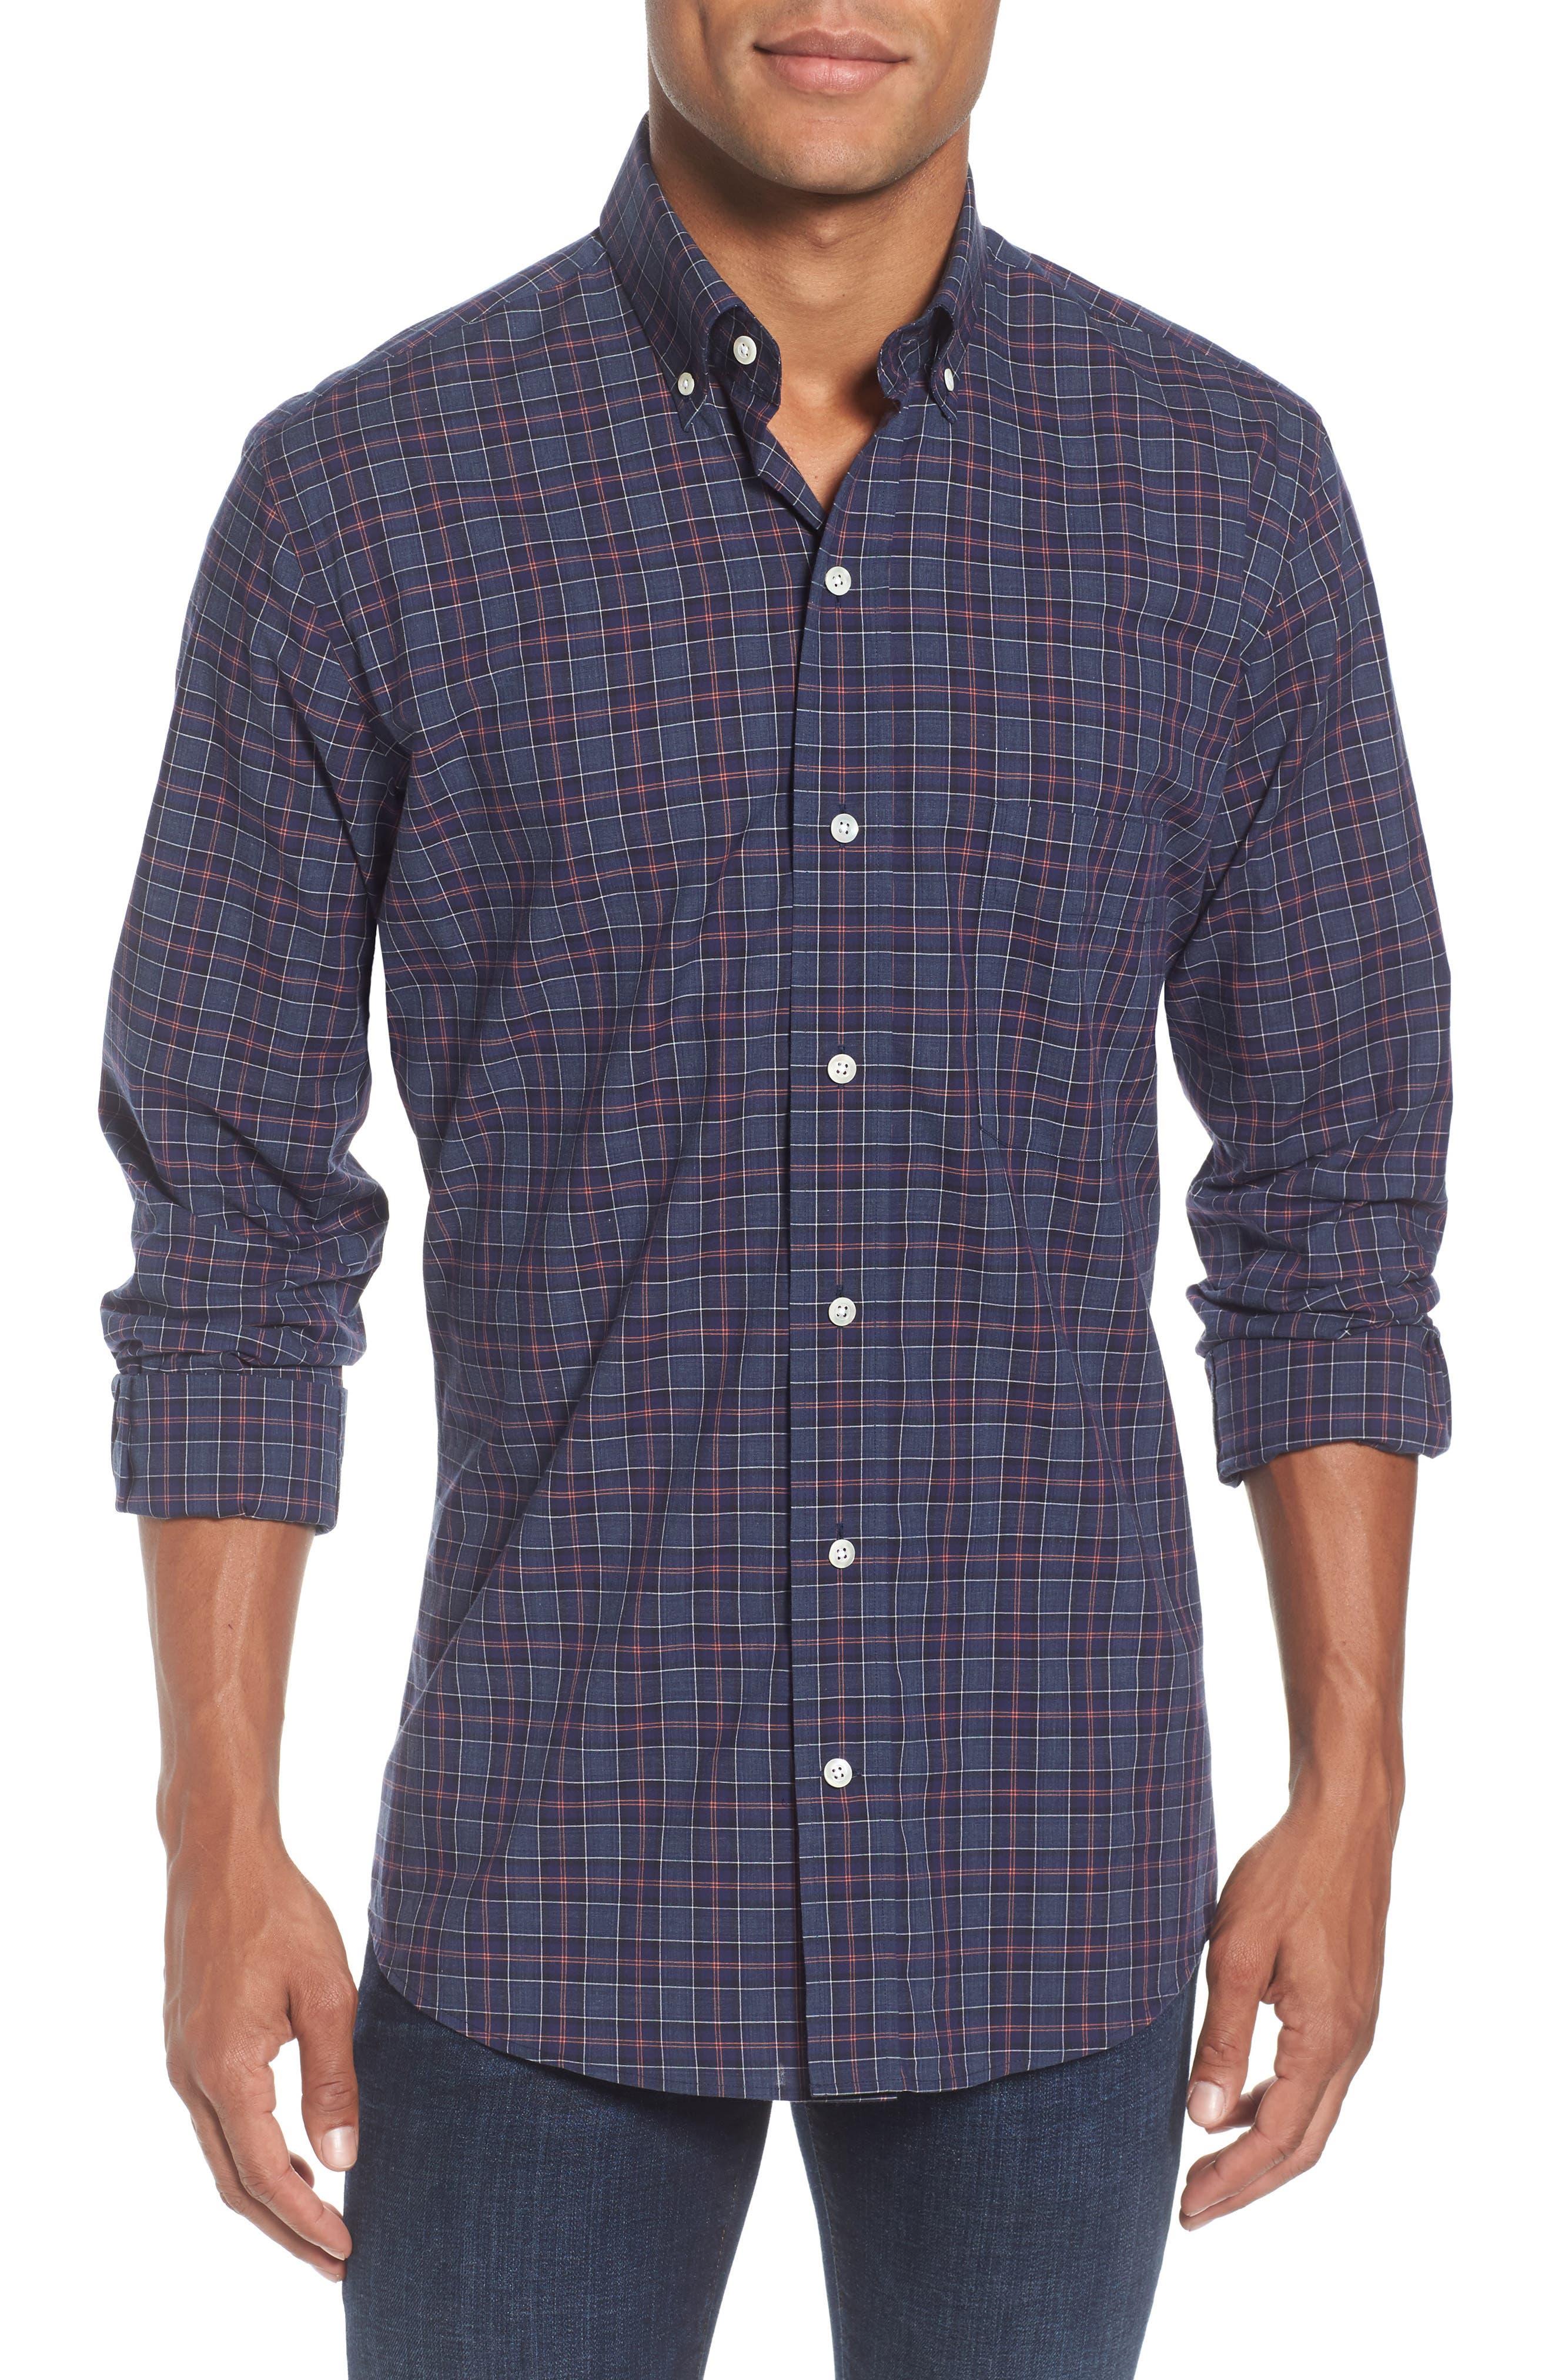 Alternate Image 1 Selected - Ledbury Slim Fit Plaid Sport Shirt